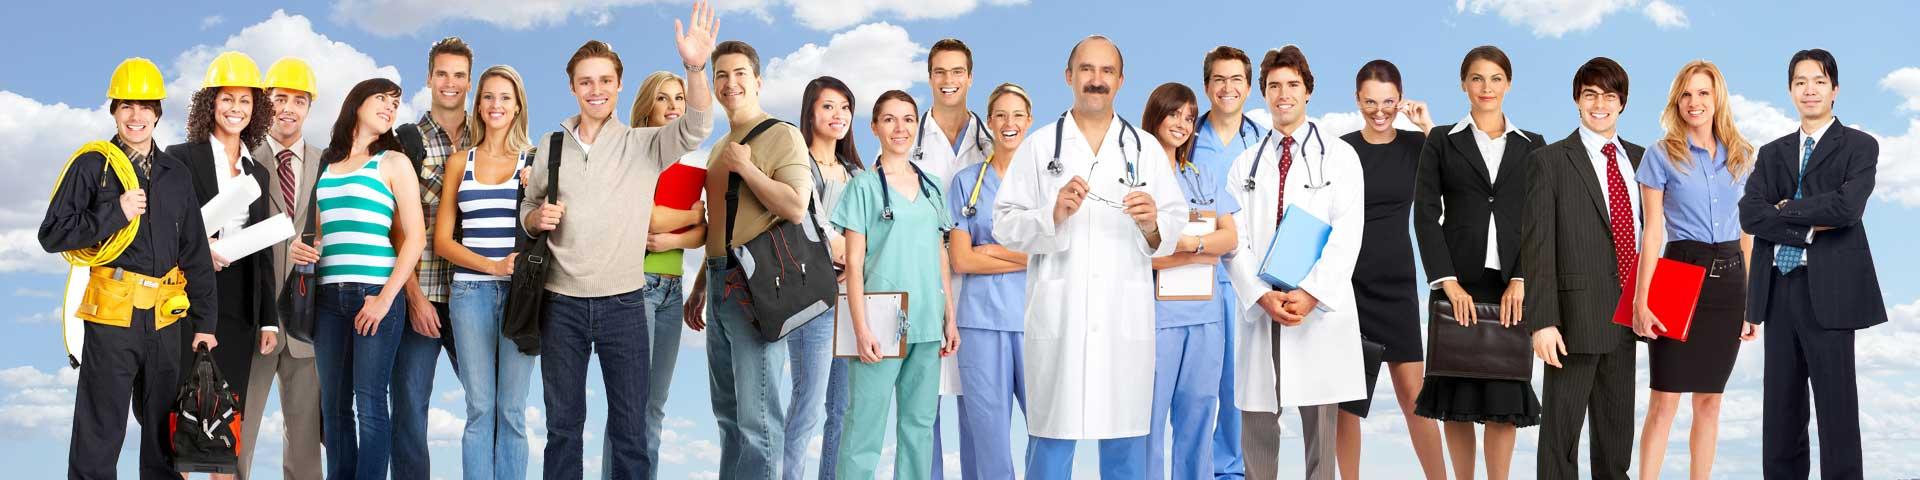 Kassa korting zorgverzekering